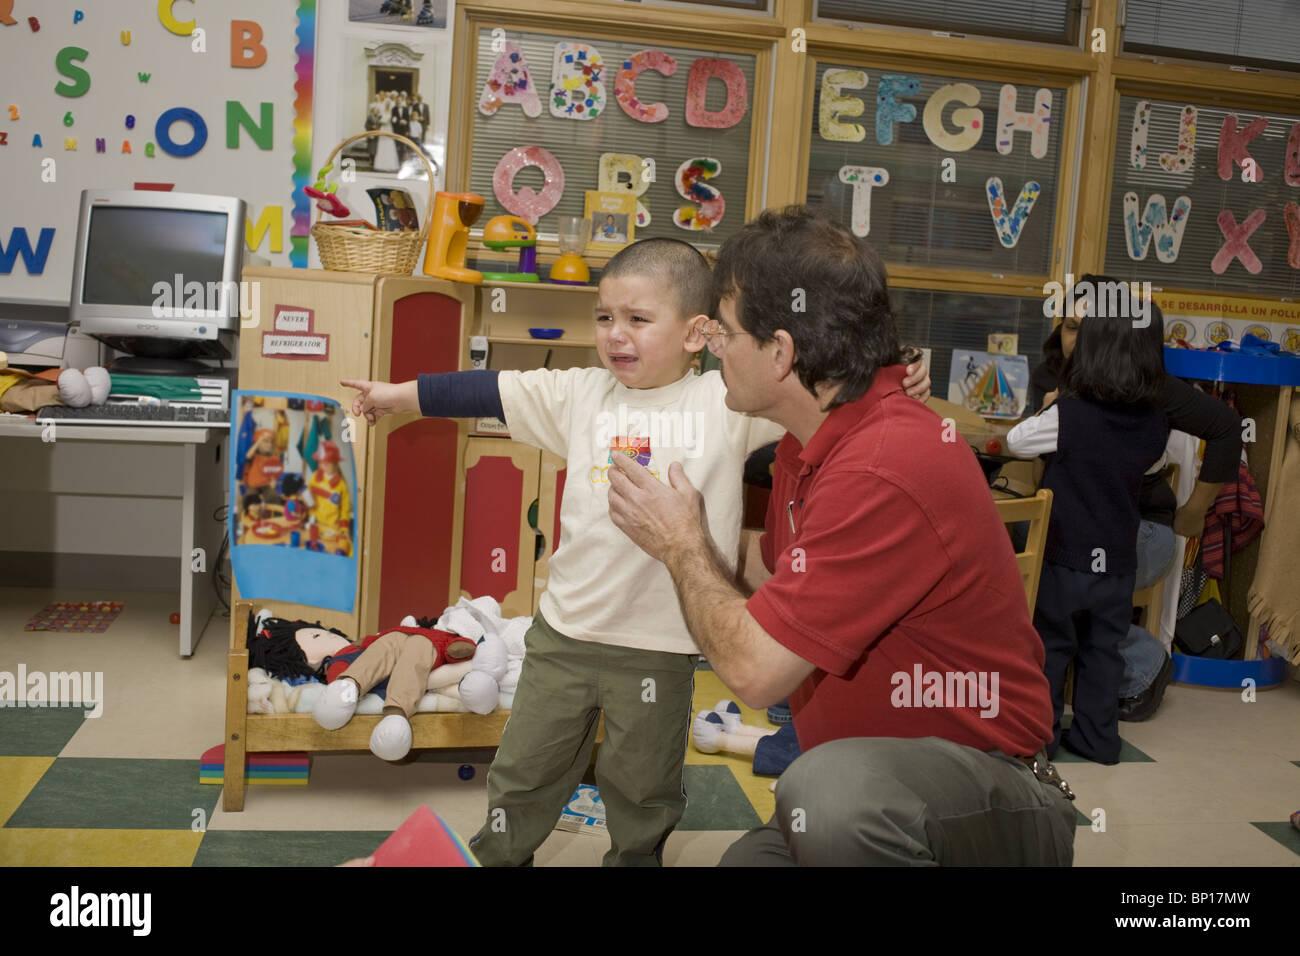 male preschool teacher comforting a crying boy in the classroom BP17MW - Male Kindergarten Teacher